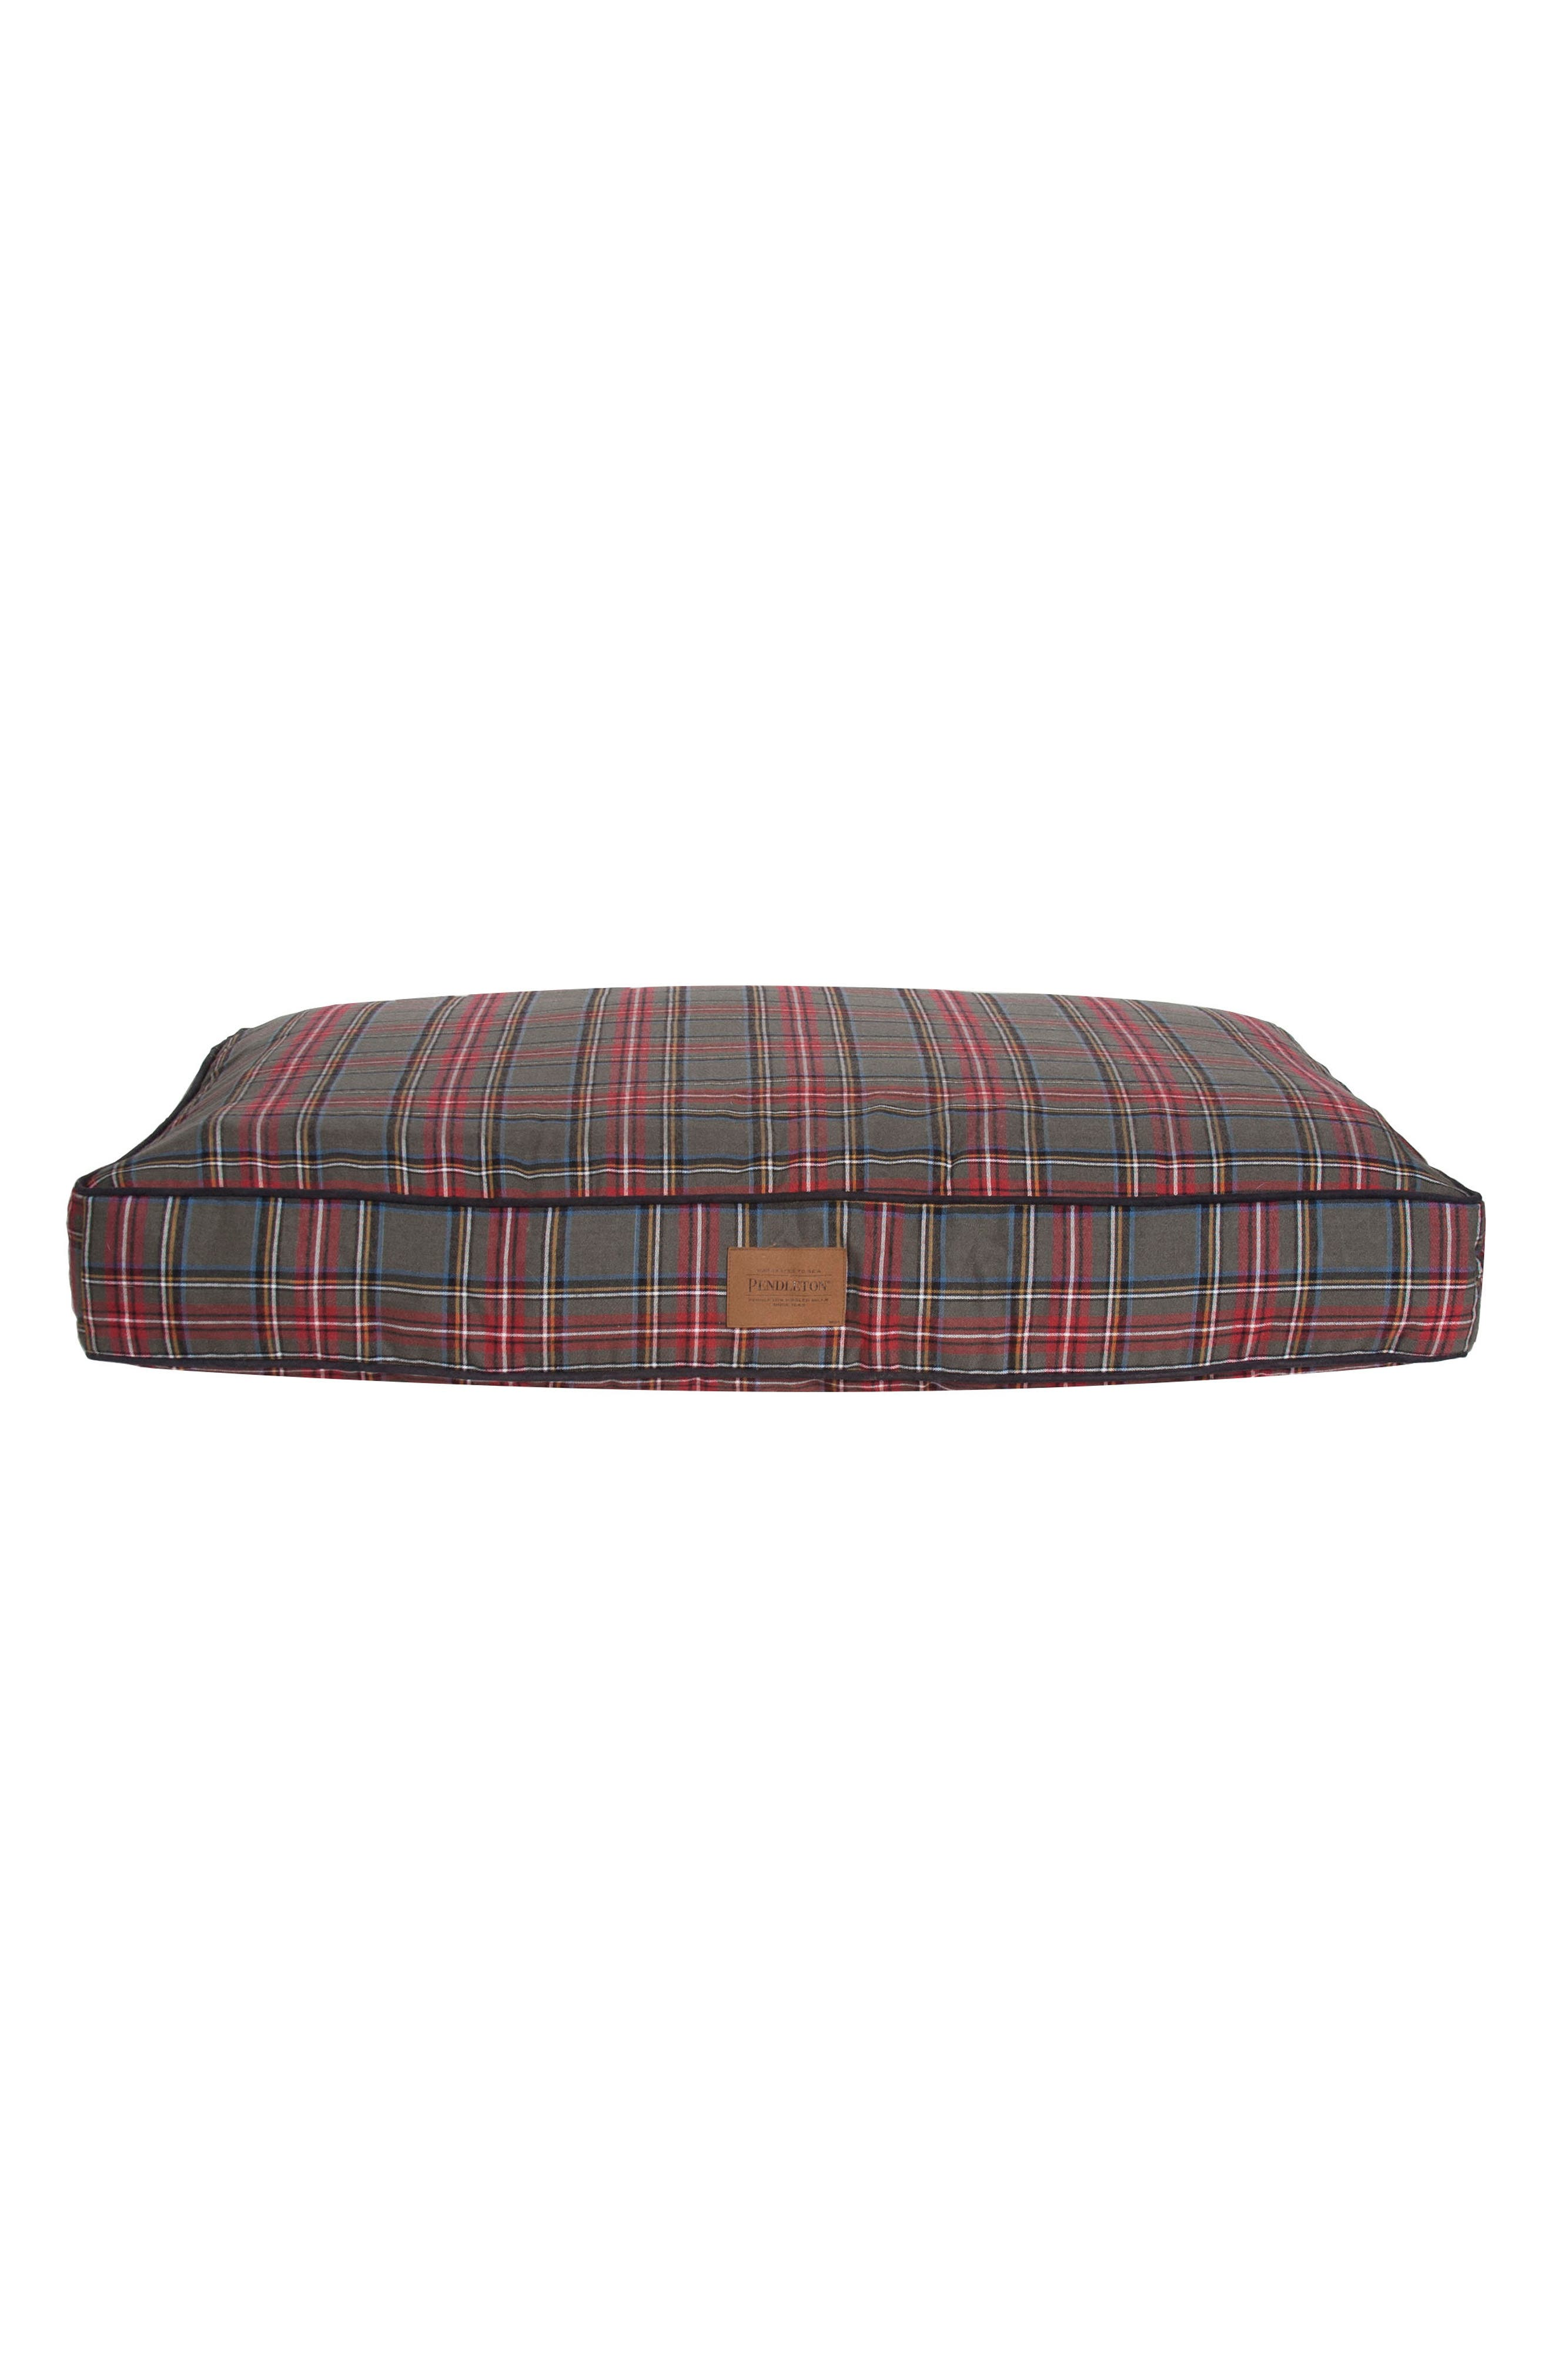 Carolina Pet Company x Pendleton Classics Tartan Pet Bed